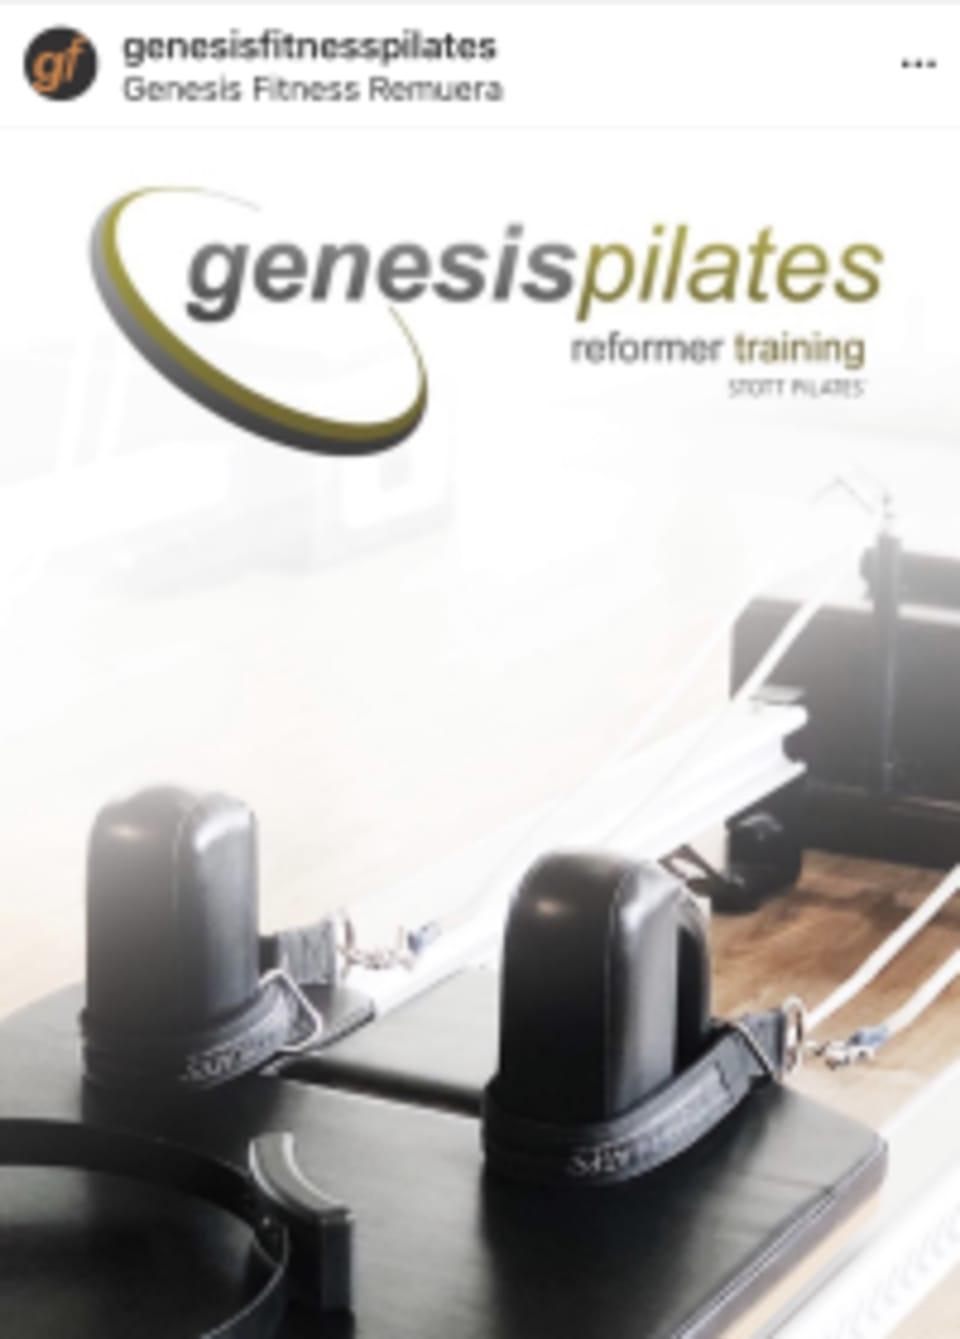 Genesis Fitness logo